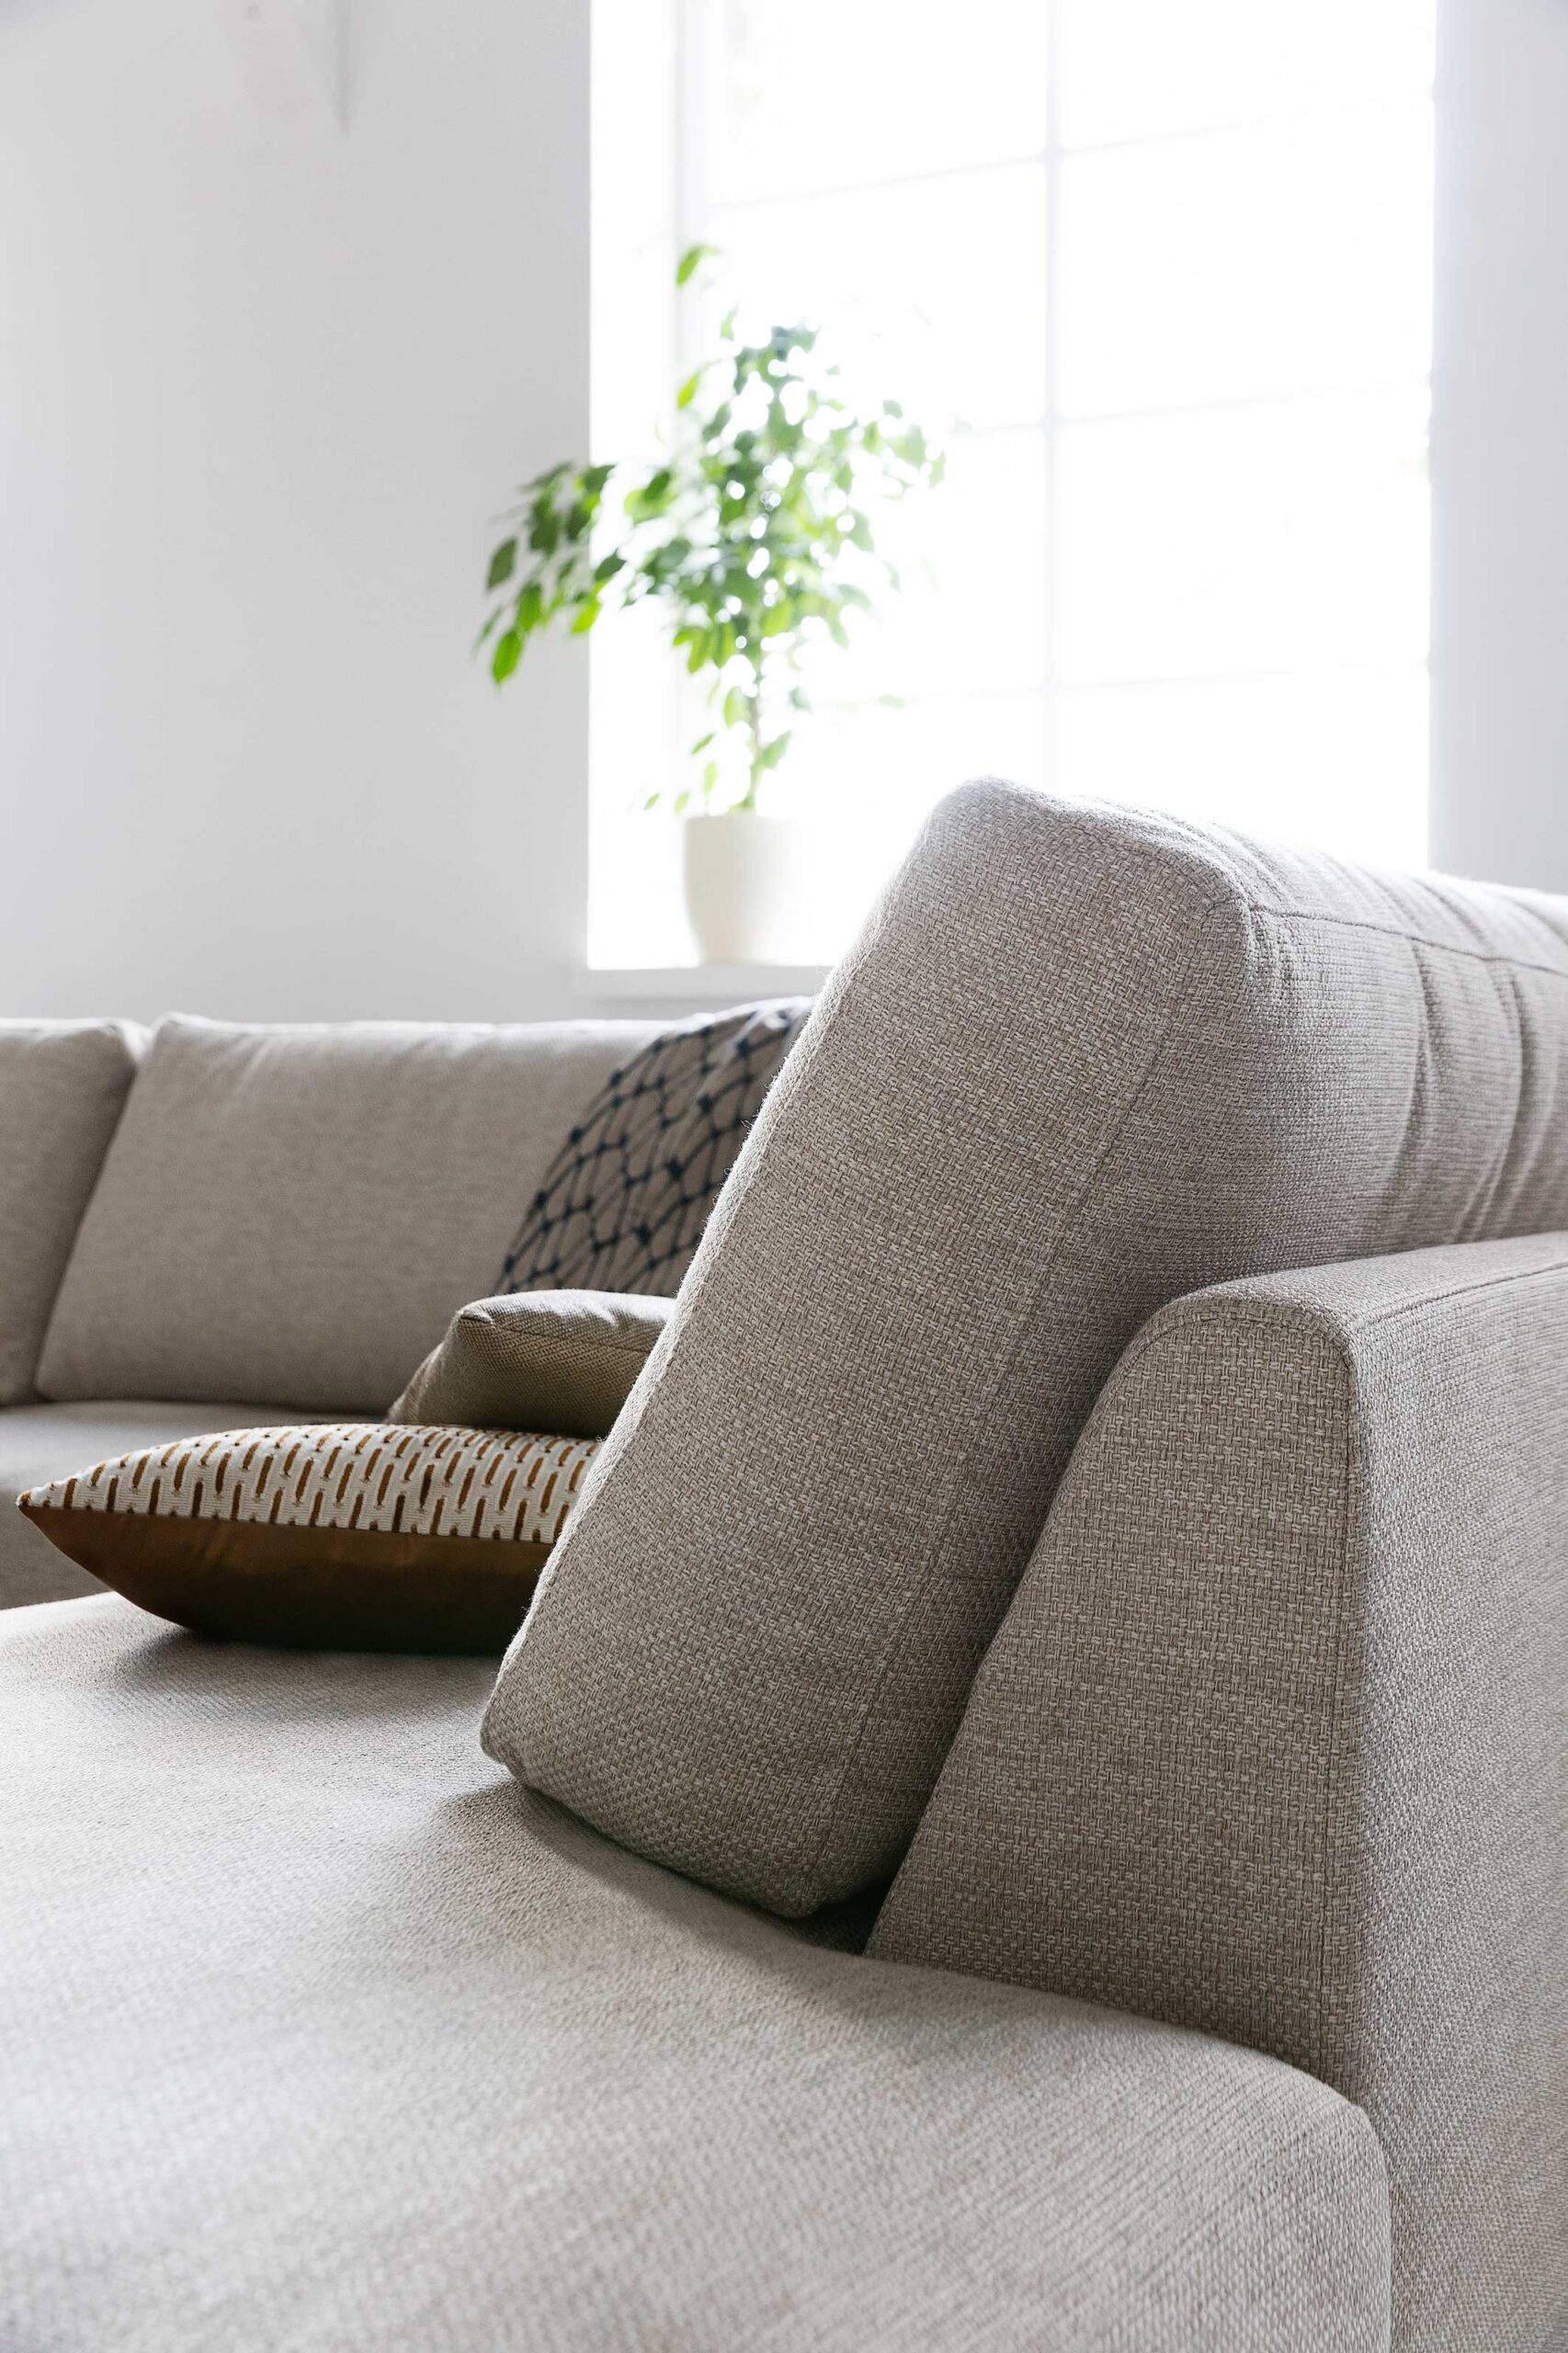 bella-milano-bankstel-detailfoto-ottoman-soofs-interieur